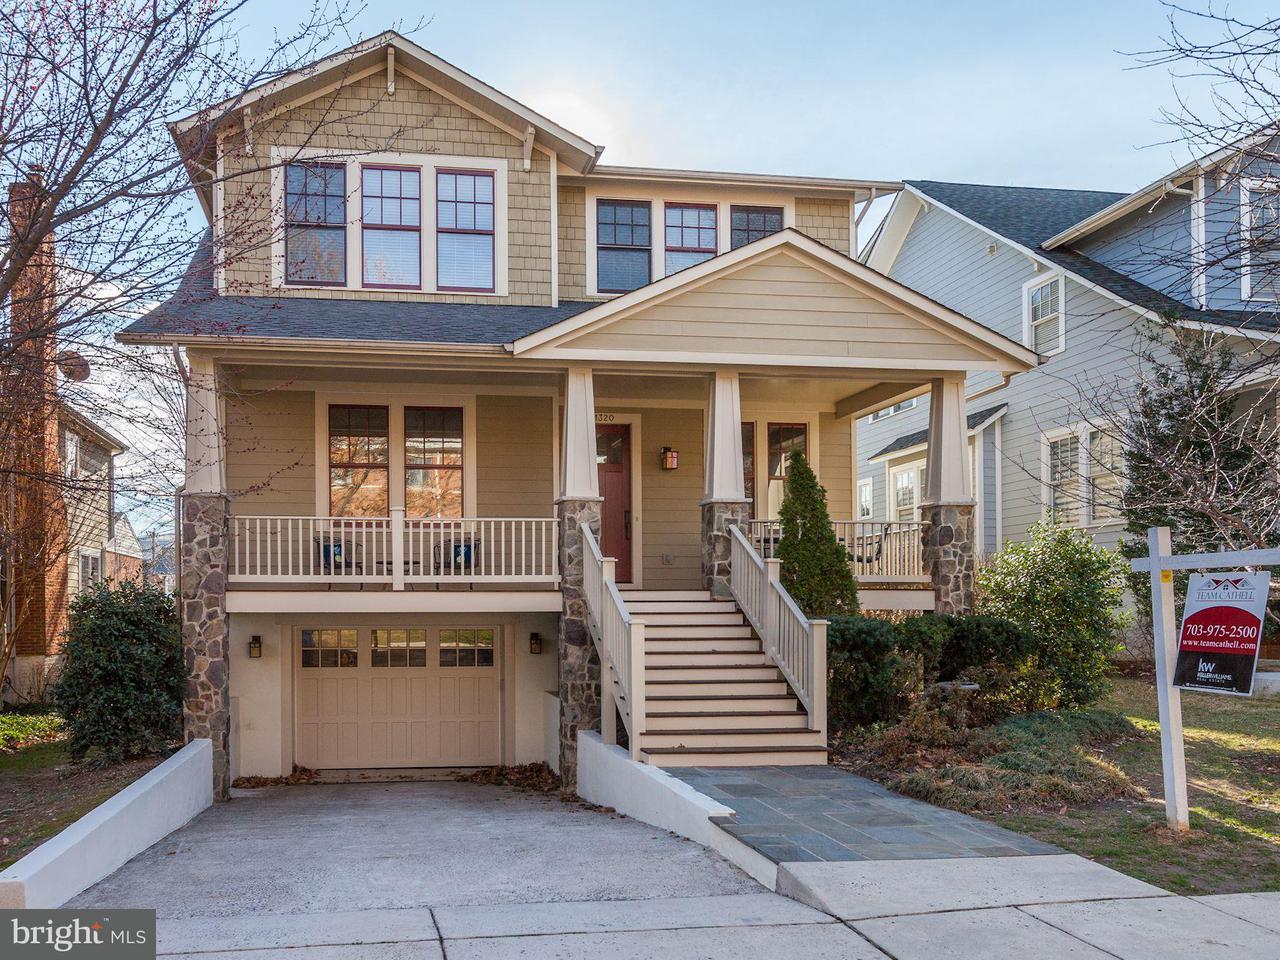 Single Family Home for Sale at 1320 Hudson St N 1320 Hudson St N Arlington, Virginia 22201 United States